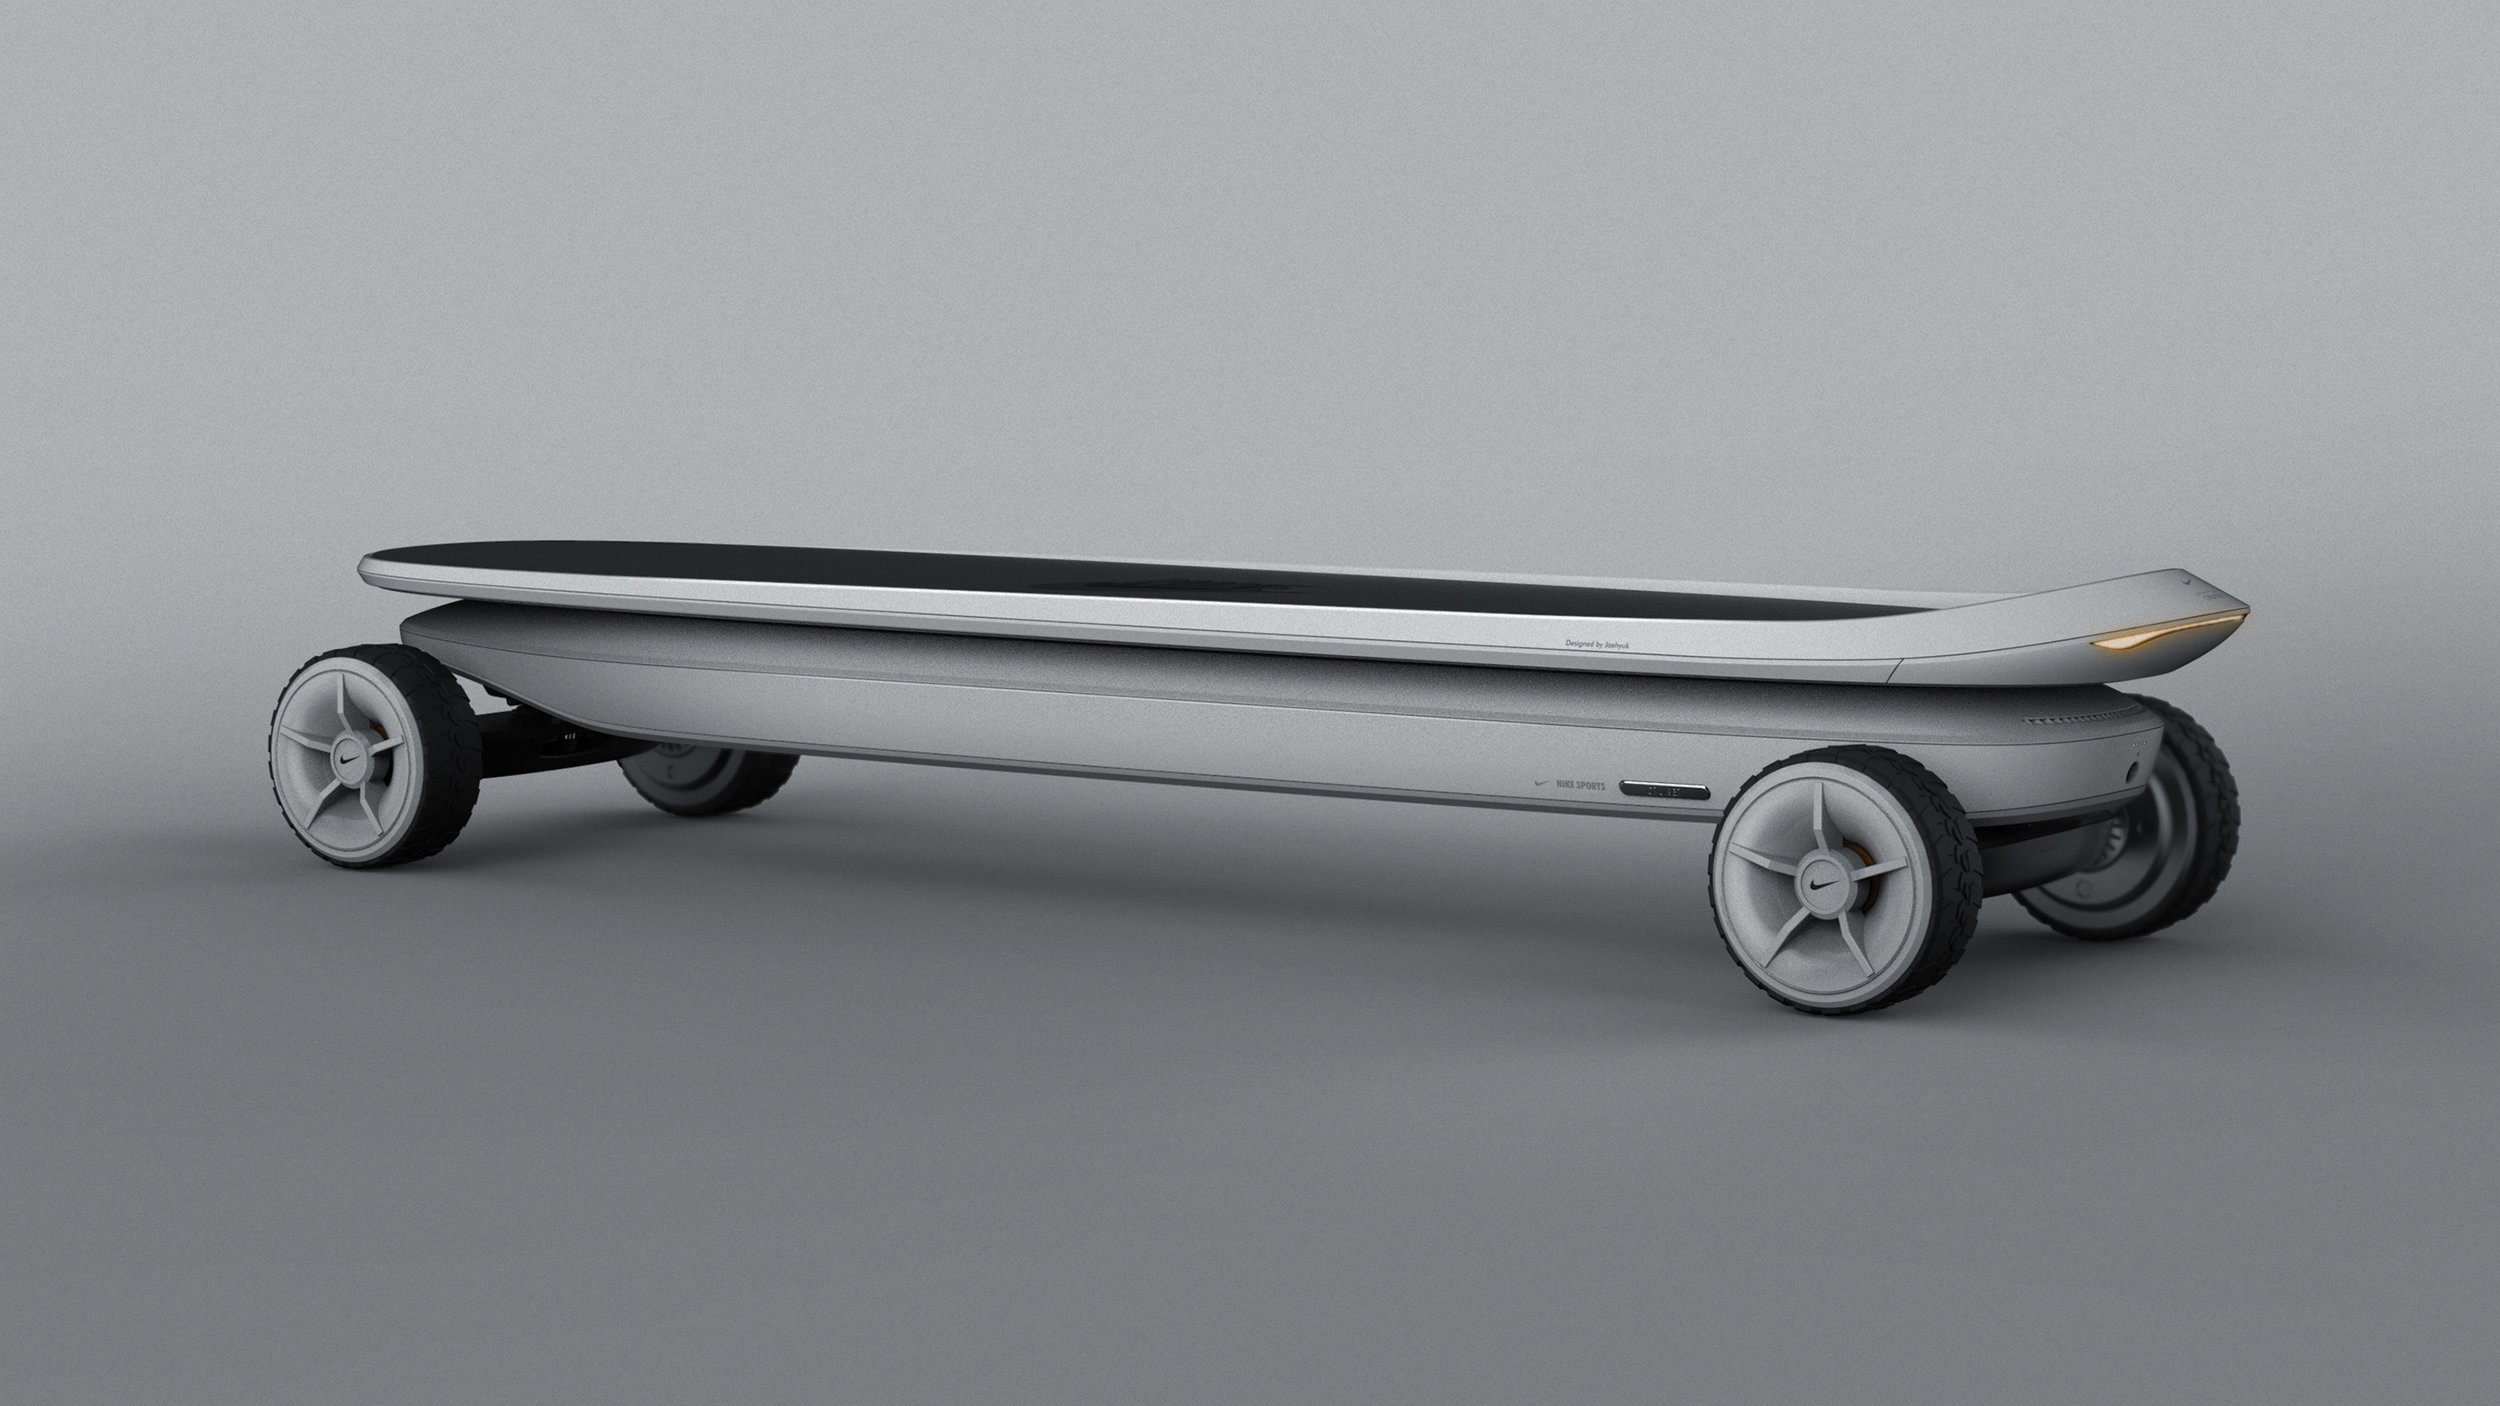 electric-scooter-jaehyuk-lim-08.jpg